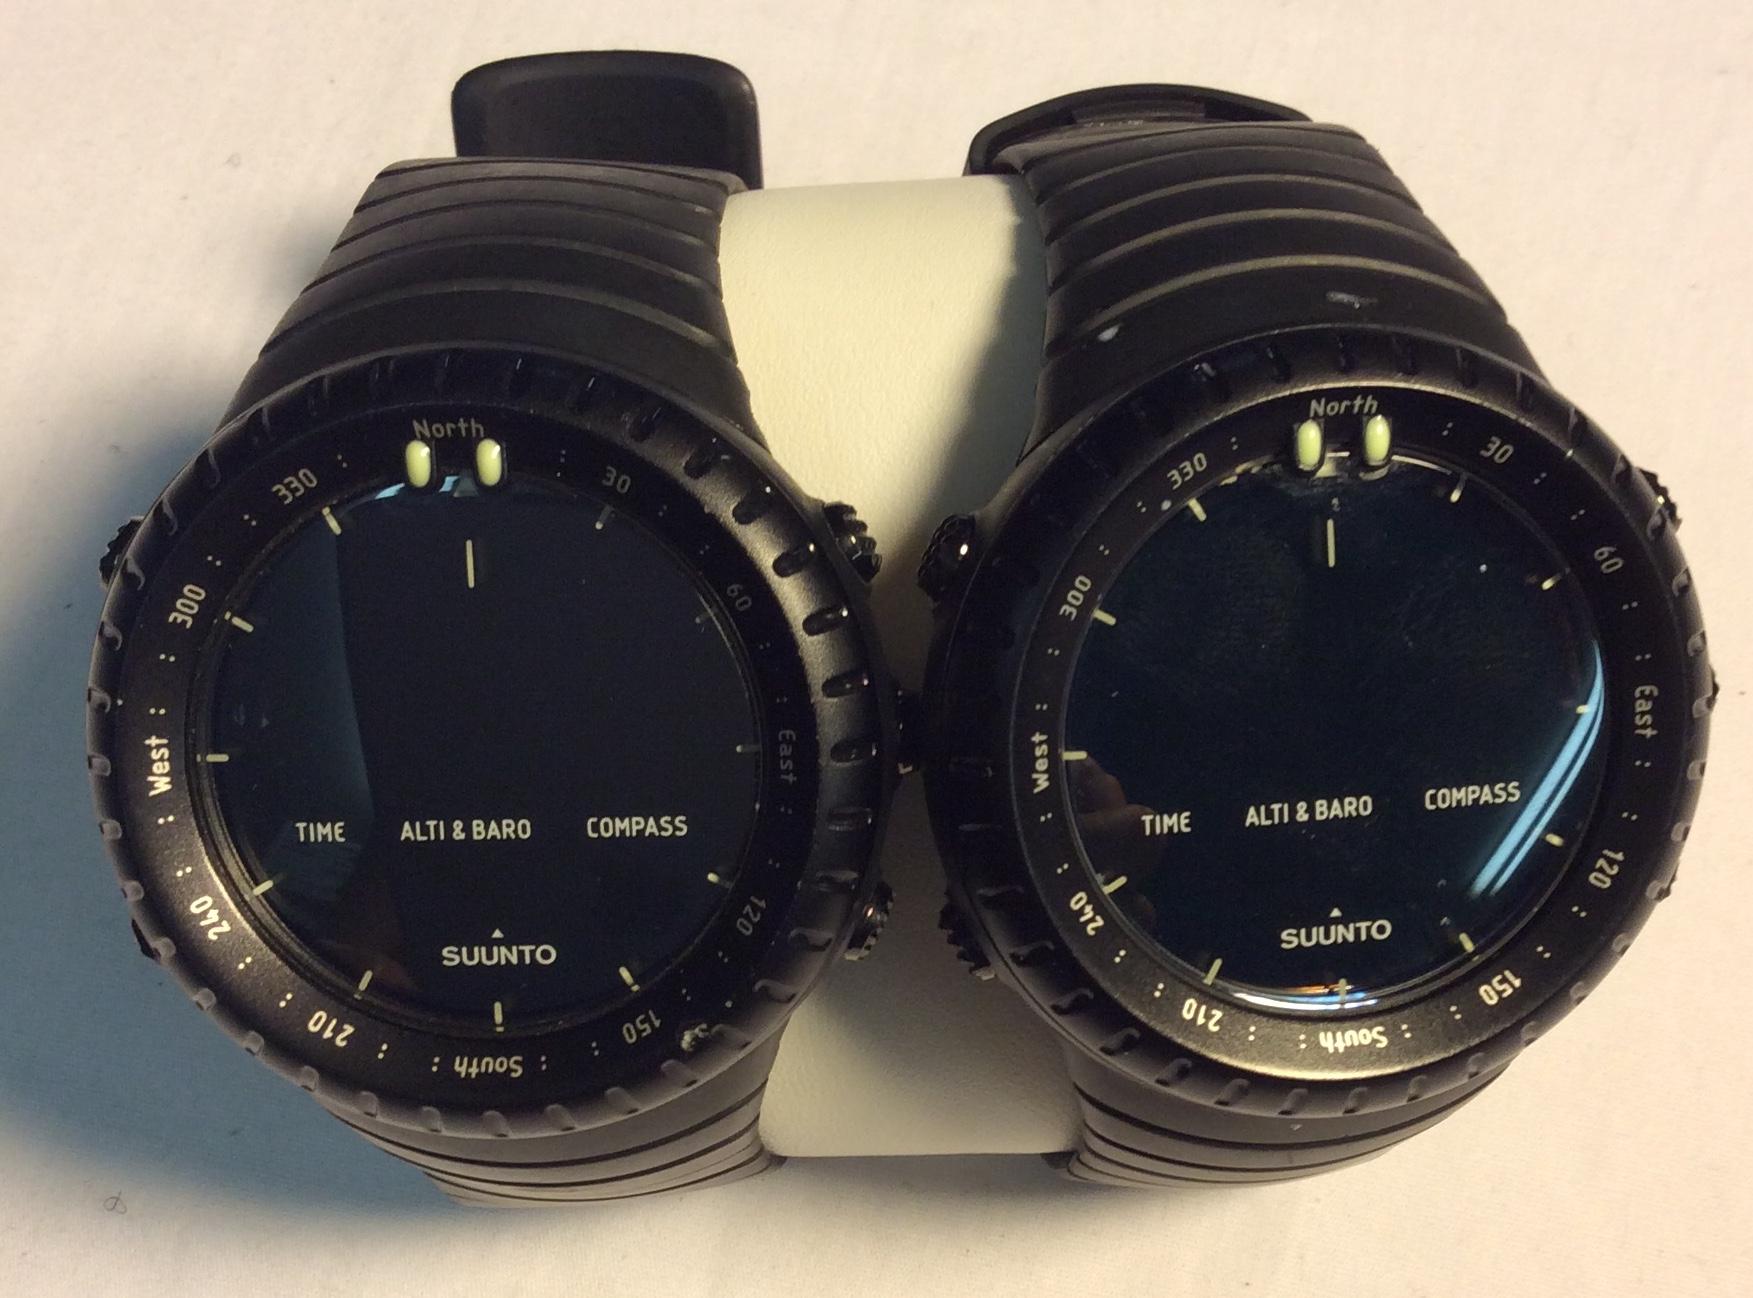 Suunto watch - round black digital